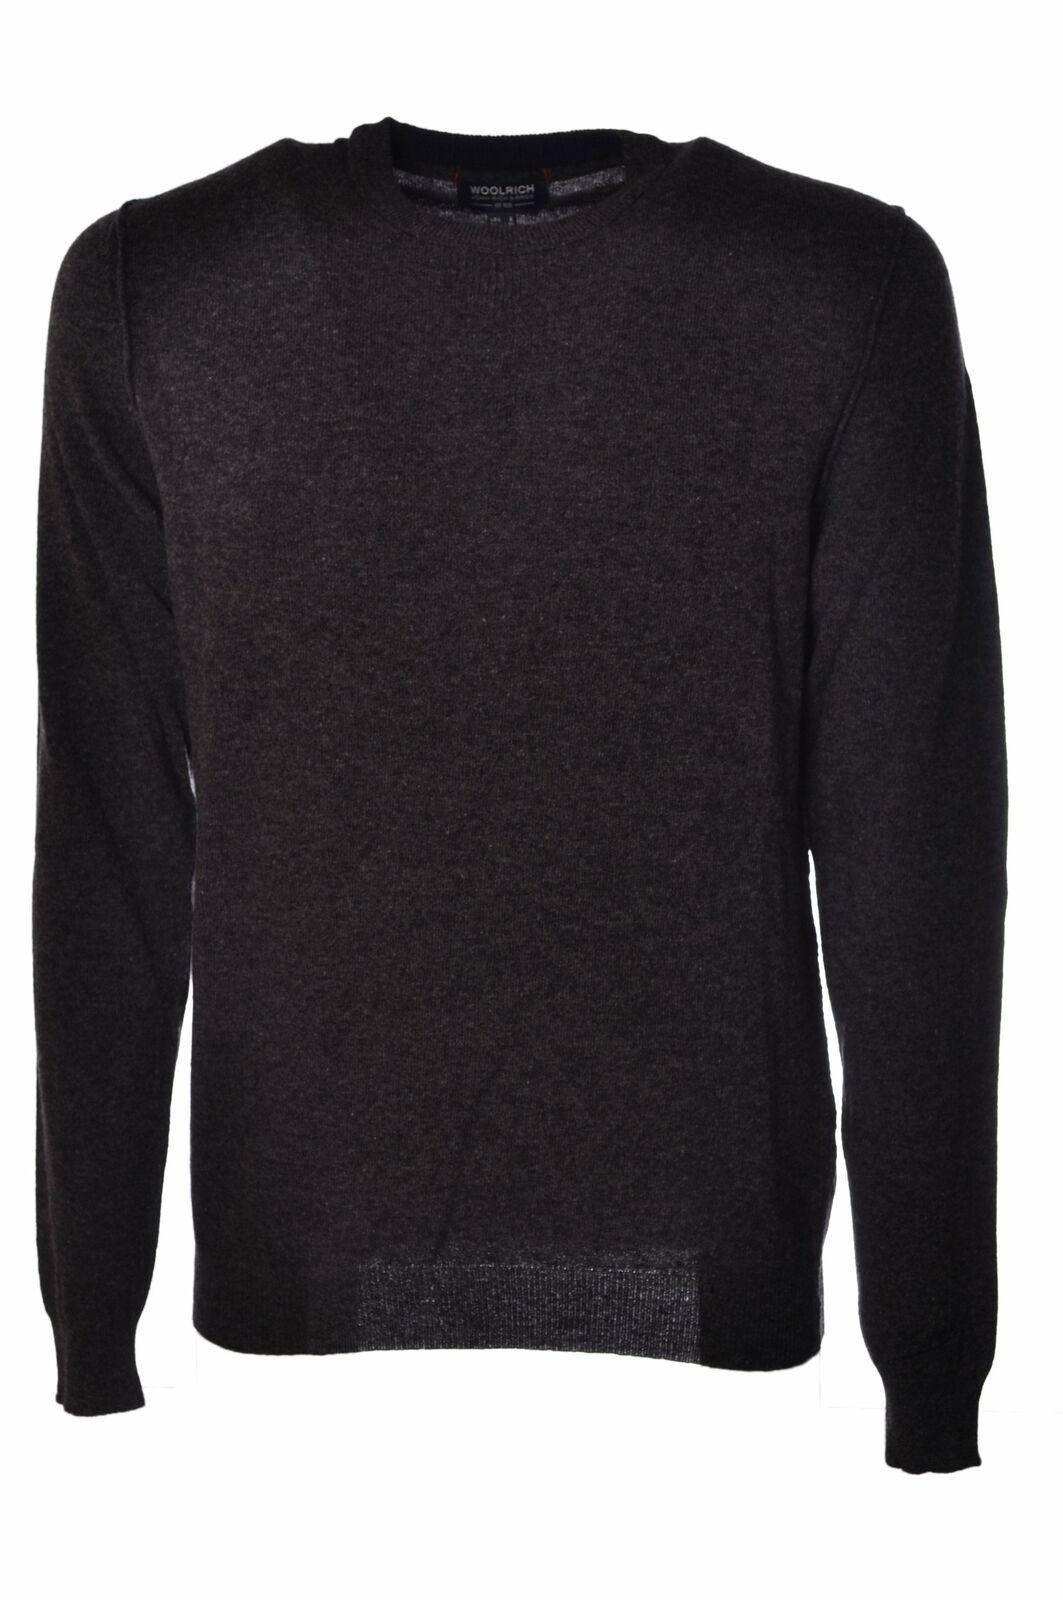 Woolrich  -  Sweaters - Male - Grau - 2638028N173530